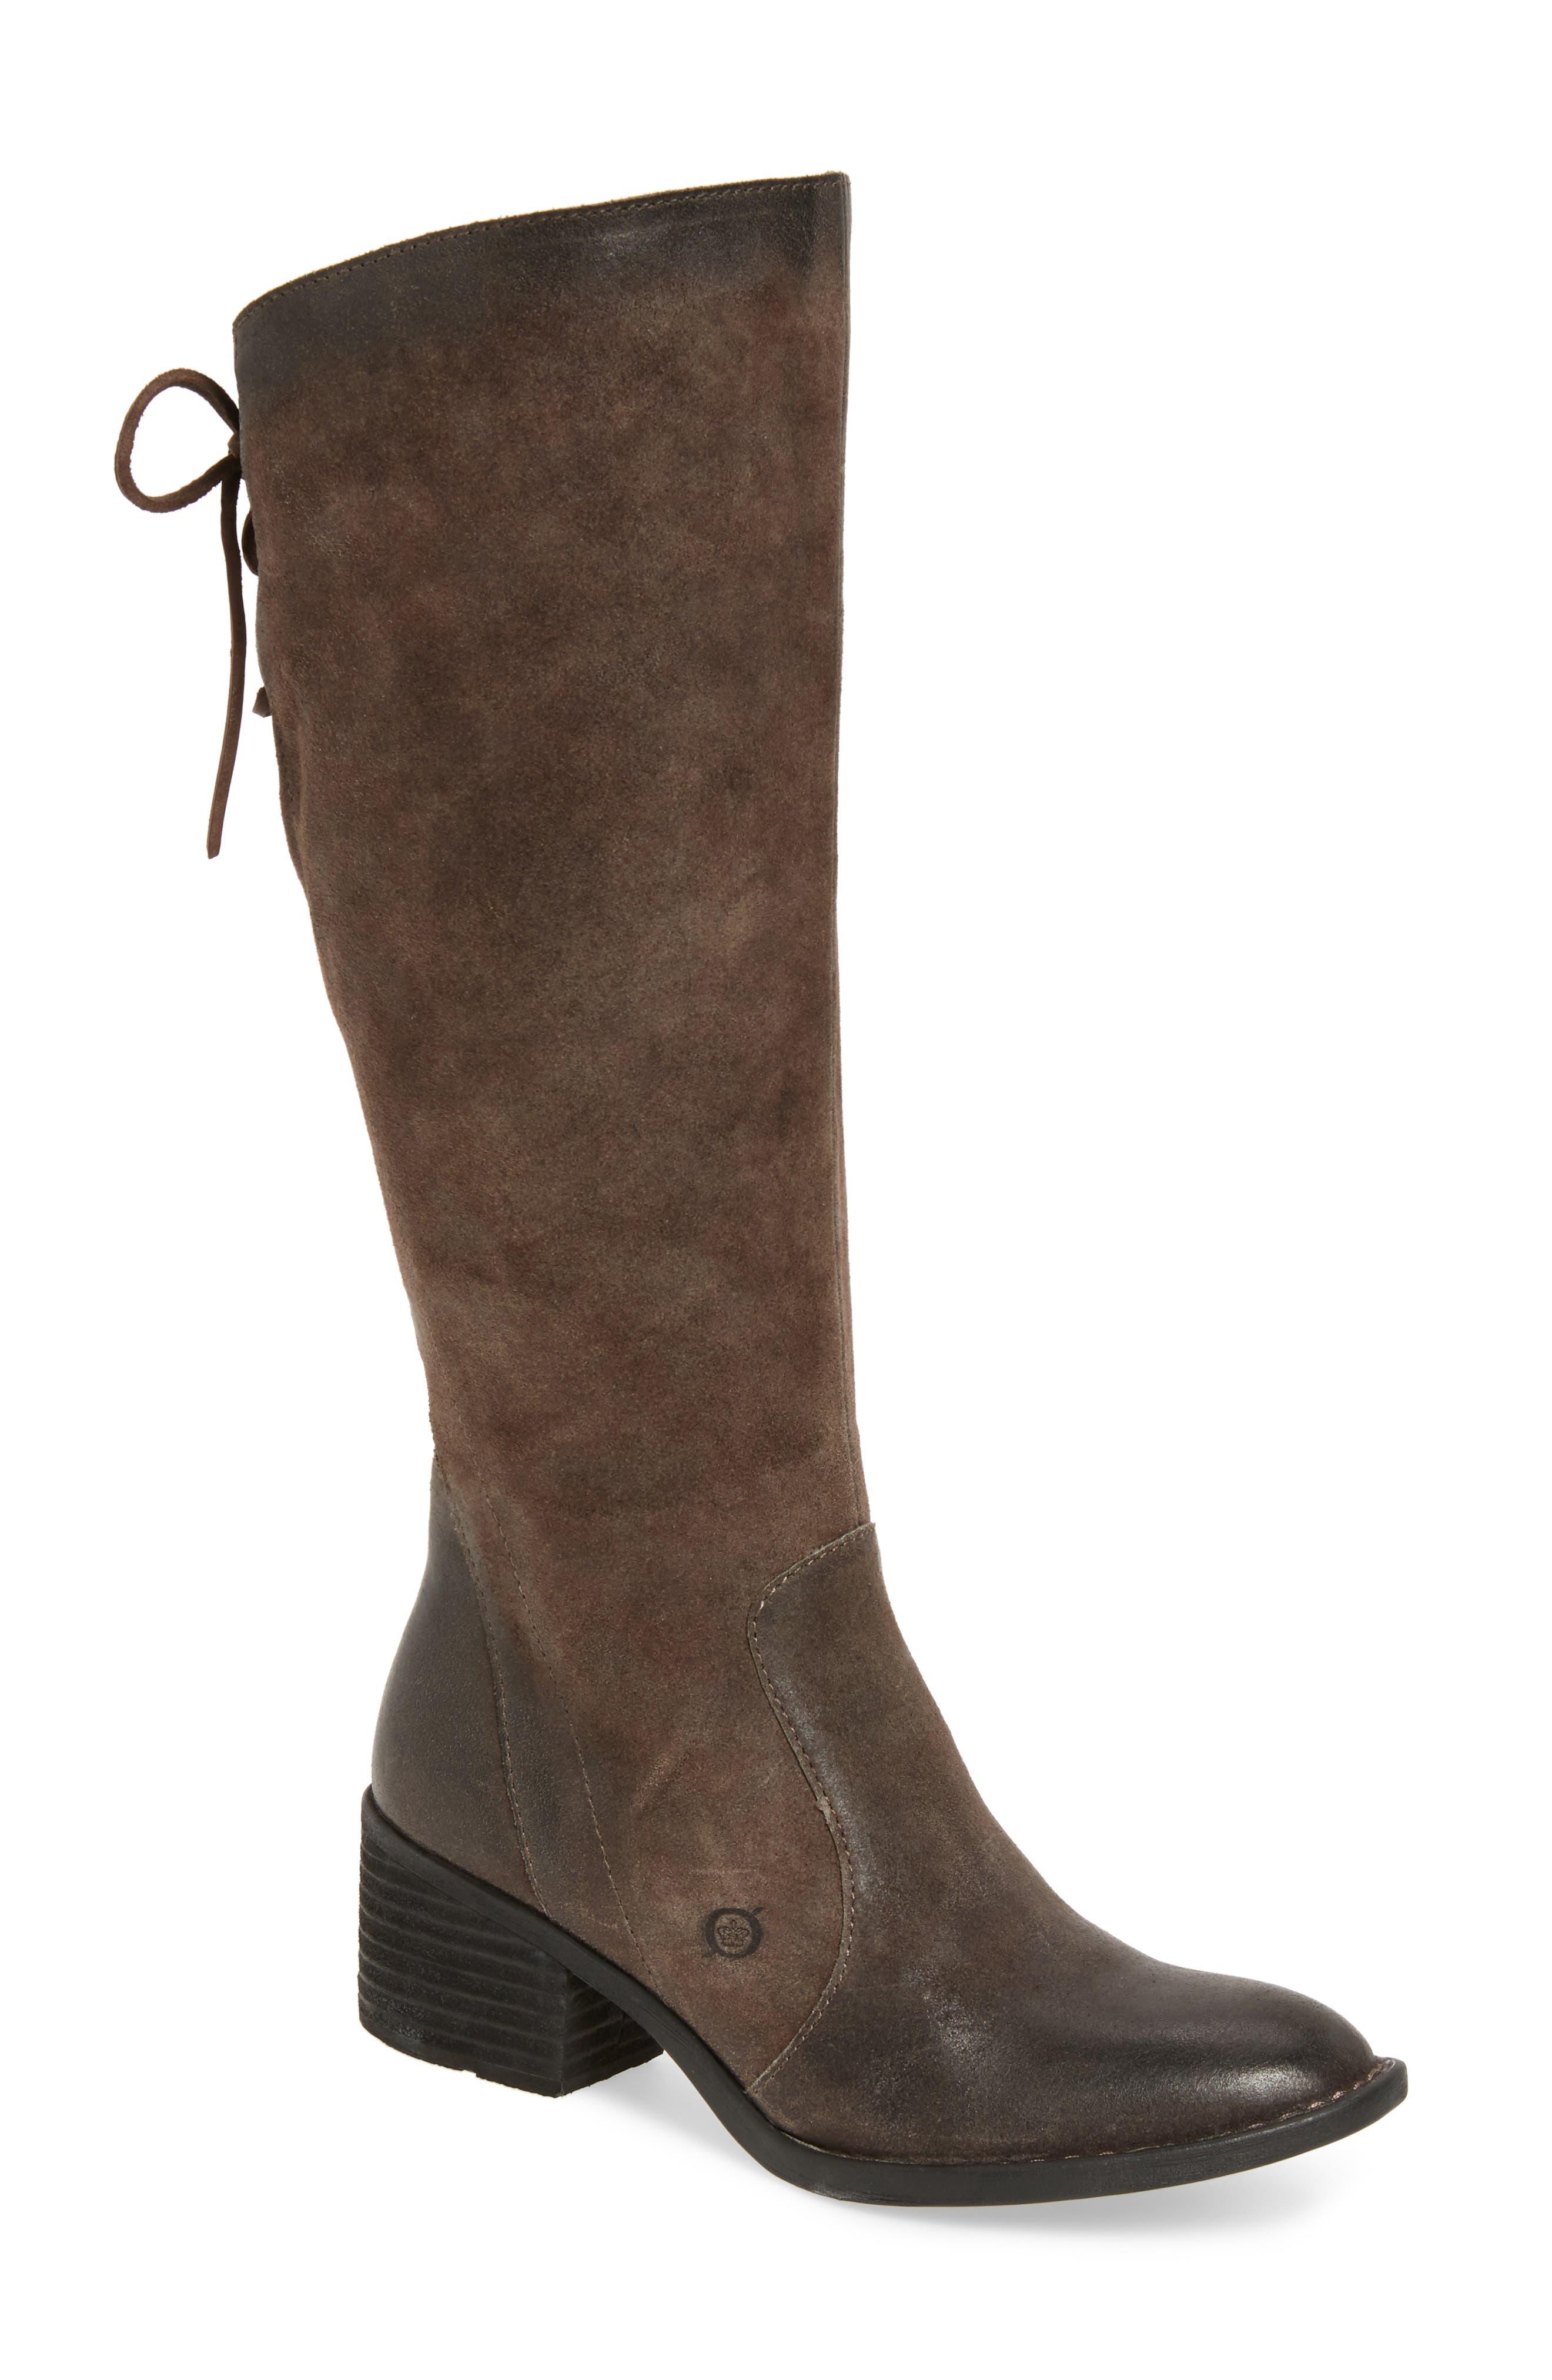 s comfort shoes boots flats mules pumps nordstrom